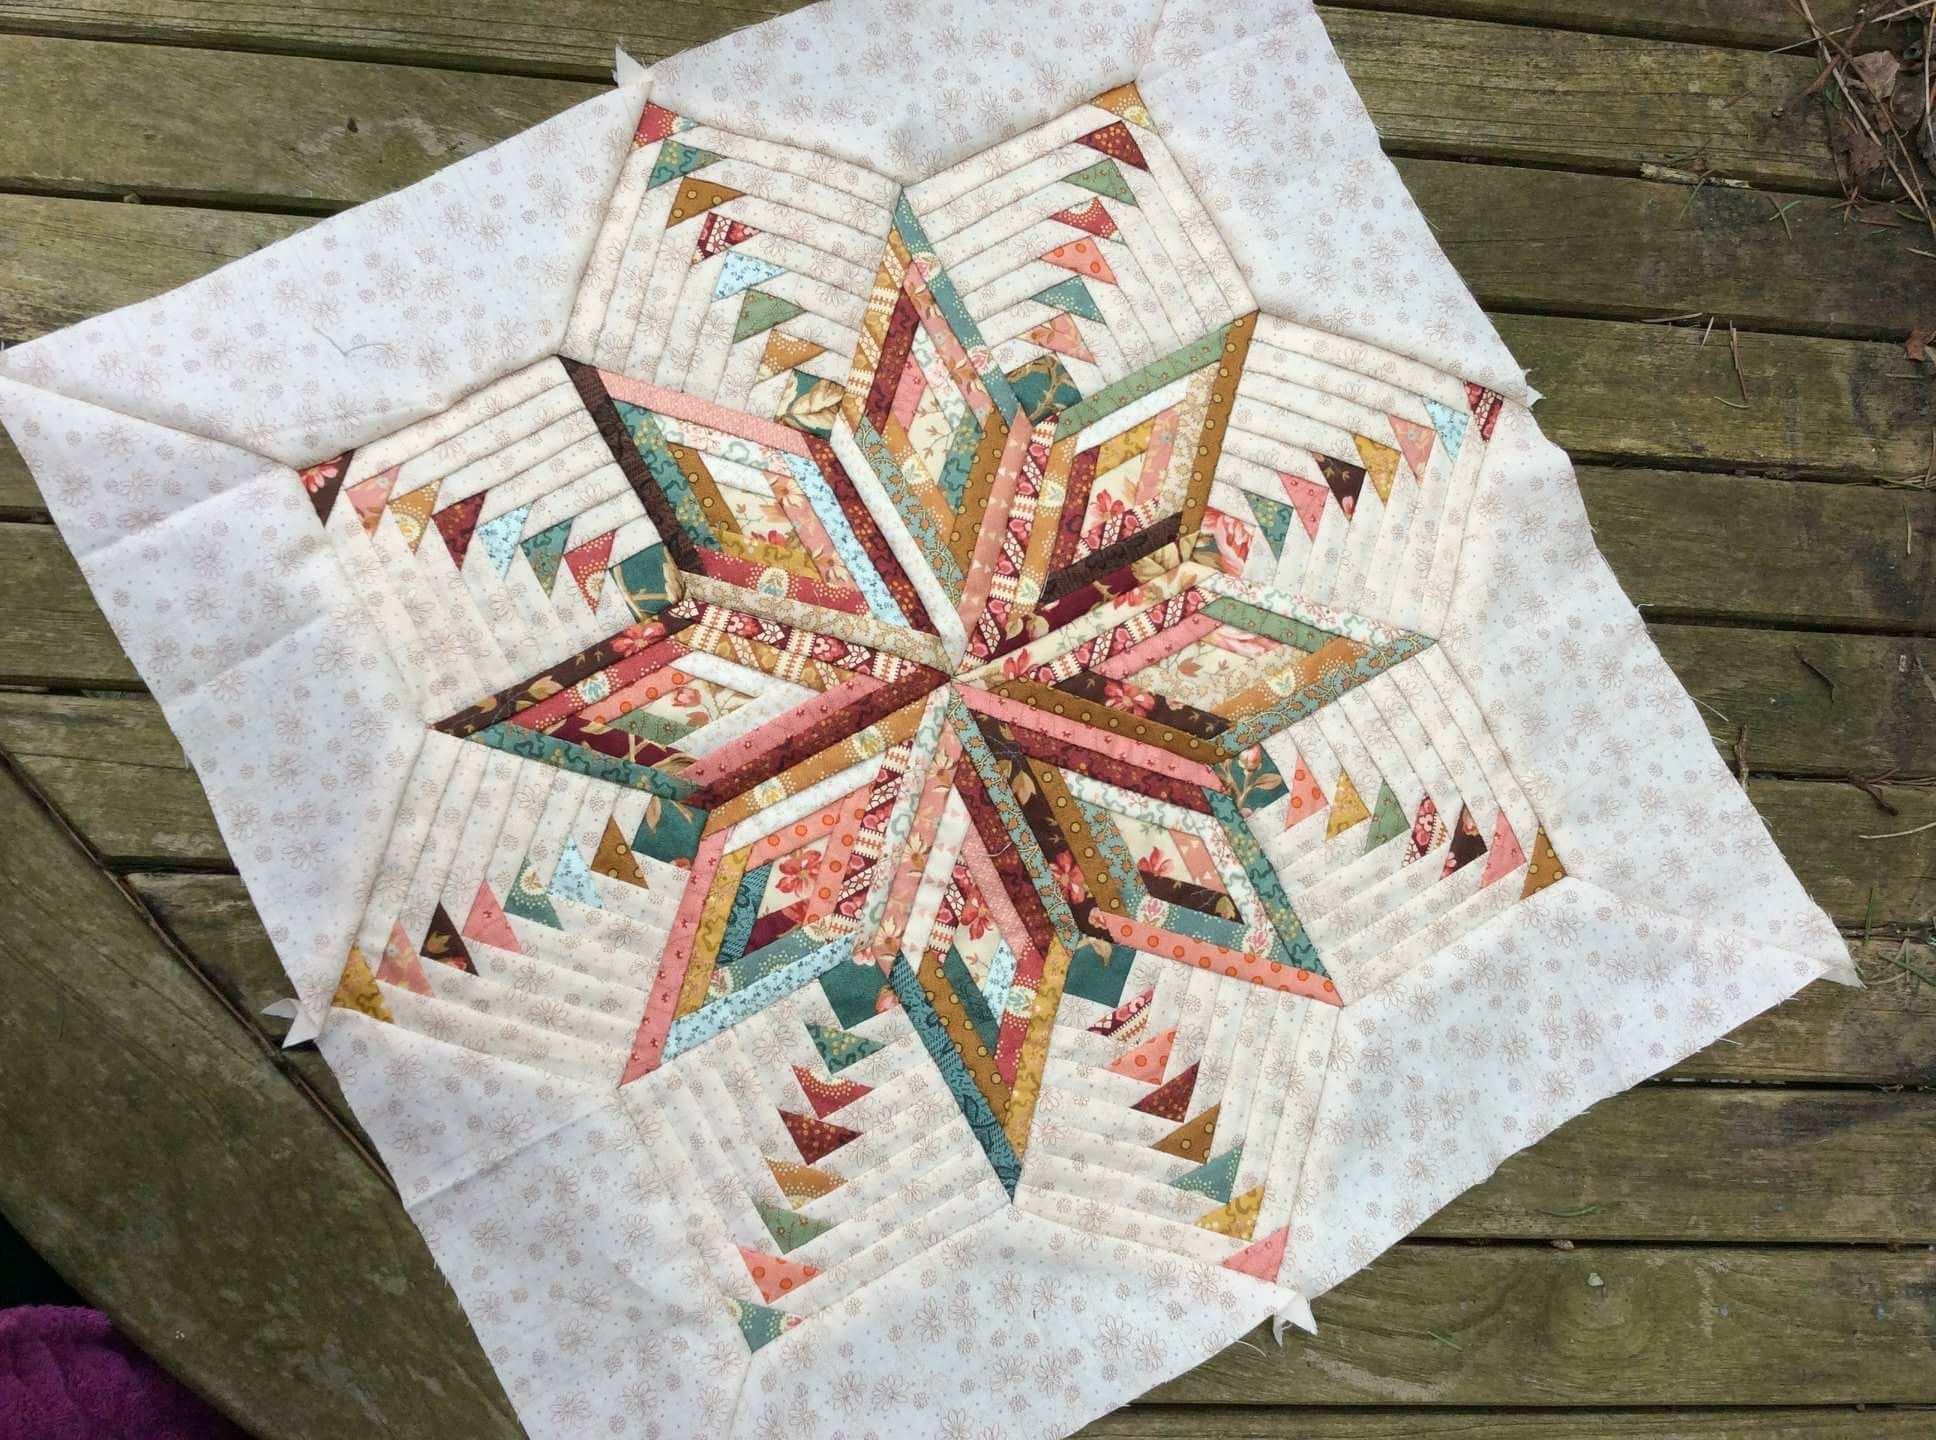 Pin De Cornelia Edelmann En Foundation Paper Pieced Quilt Blocks Patrones De Patchwork Patrones De Colchas Patrones